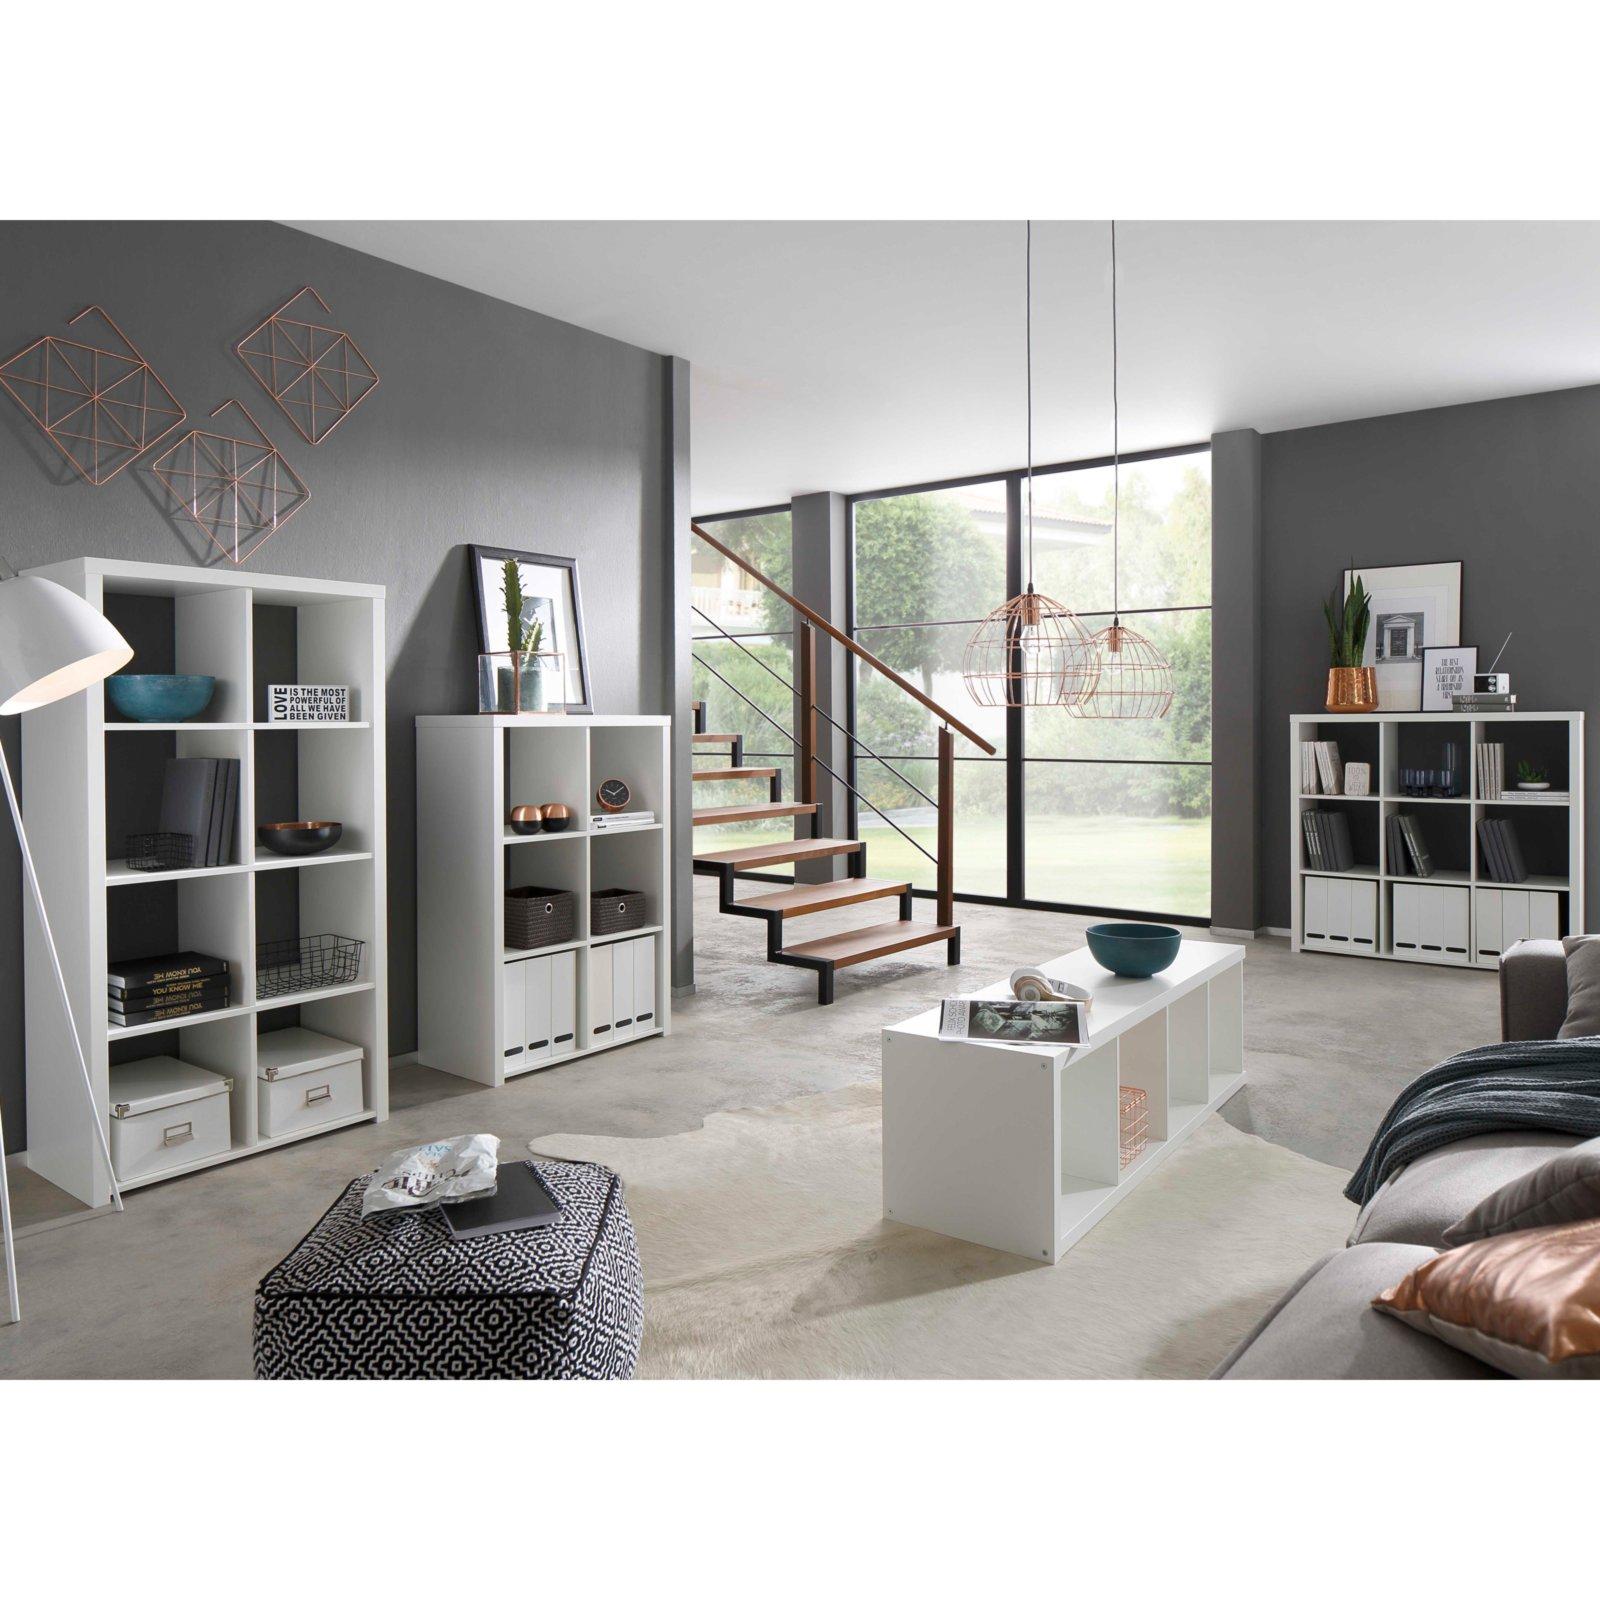 Regal MARTA - weiß - 3x2 Fächer | eBay